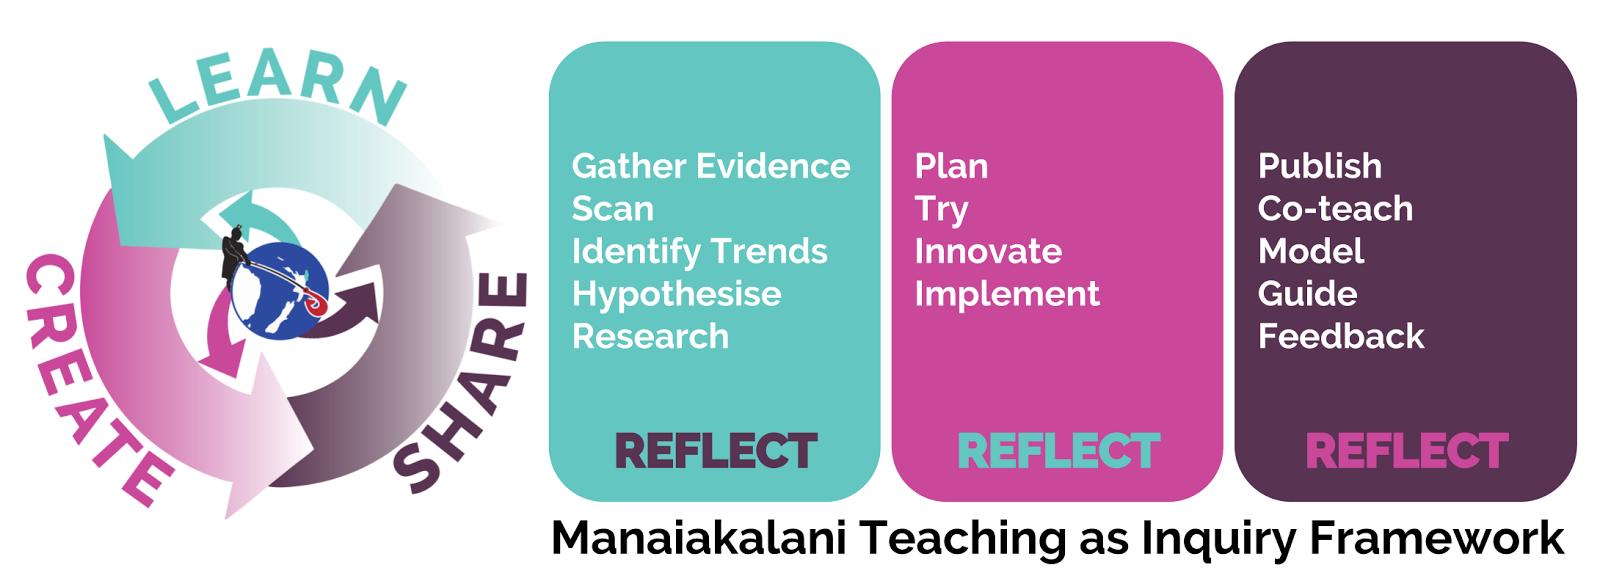 Manaiakalani CoL Inquiry 2017 & 2019